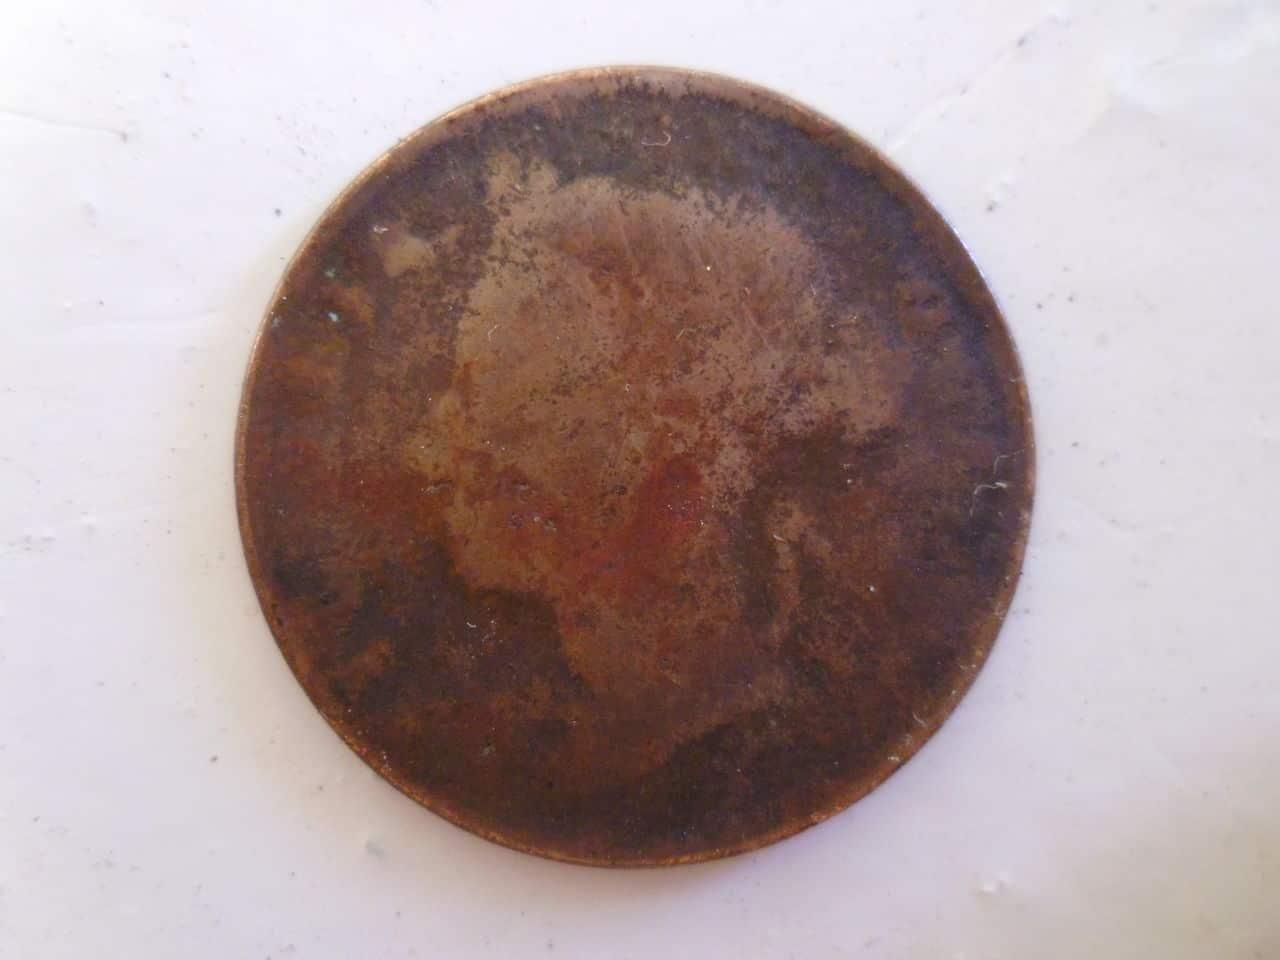 Moneda inglesa a identificar P1110689